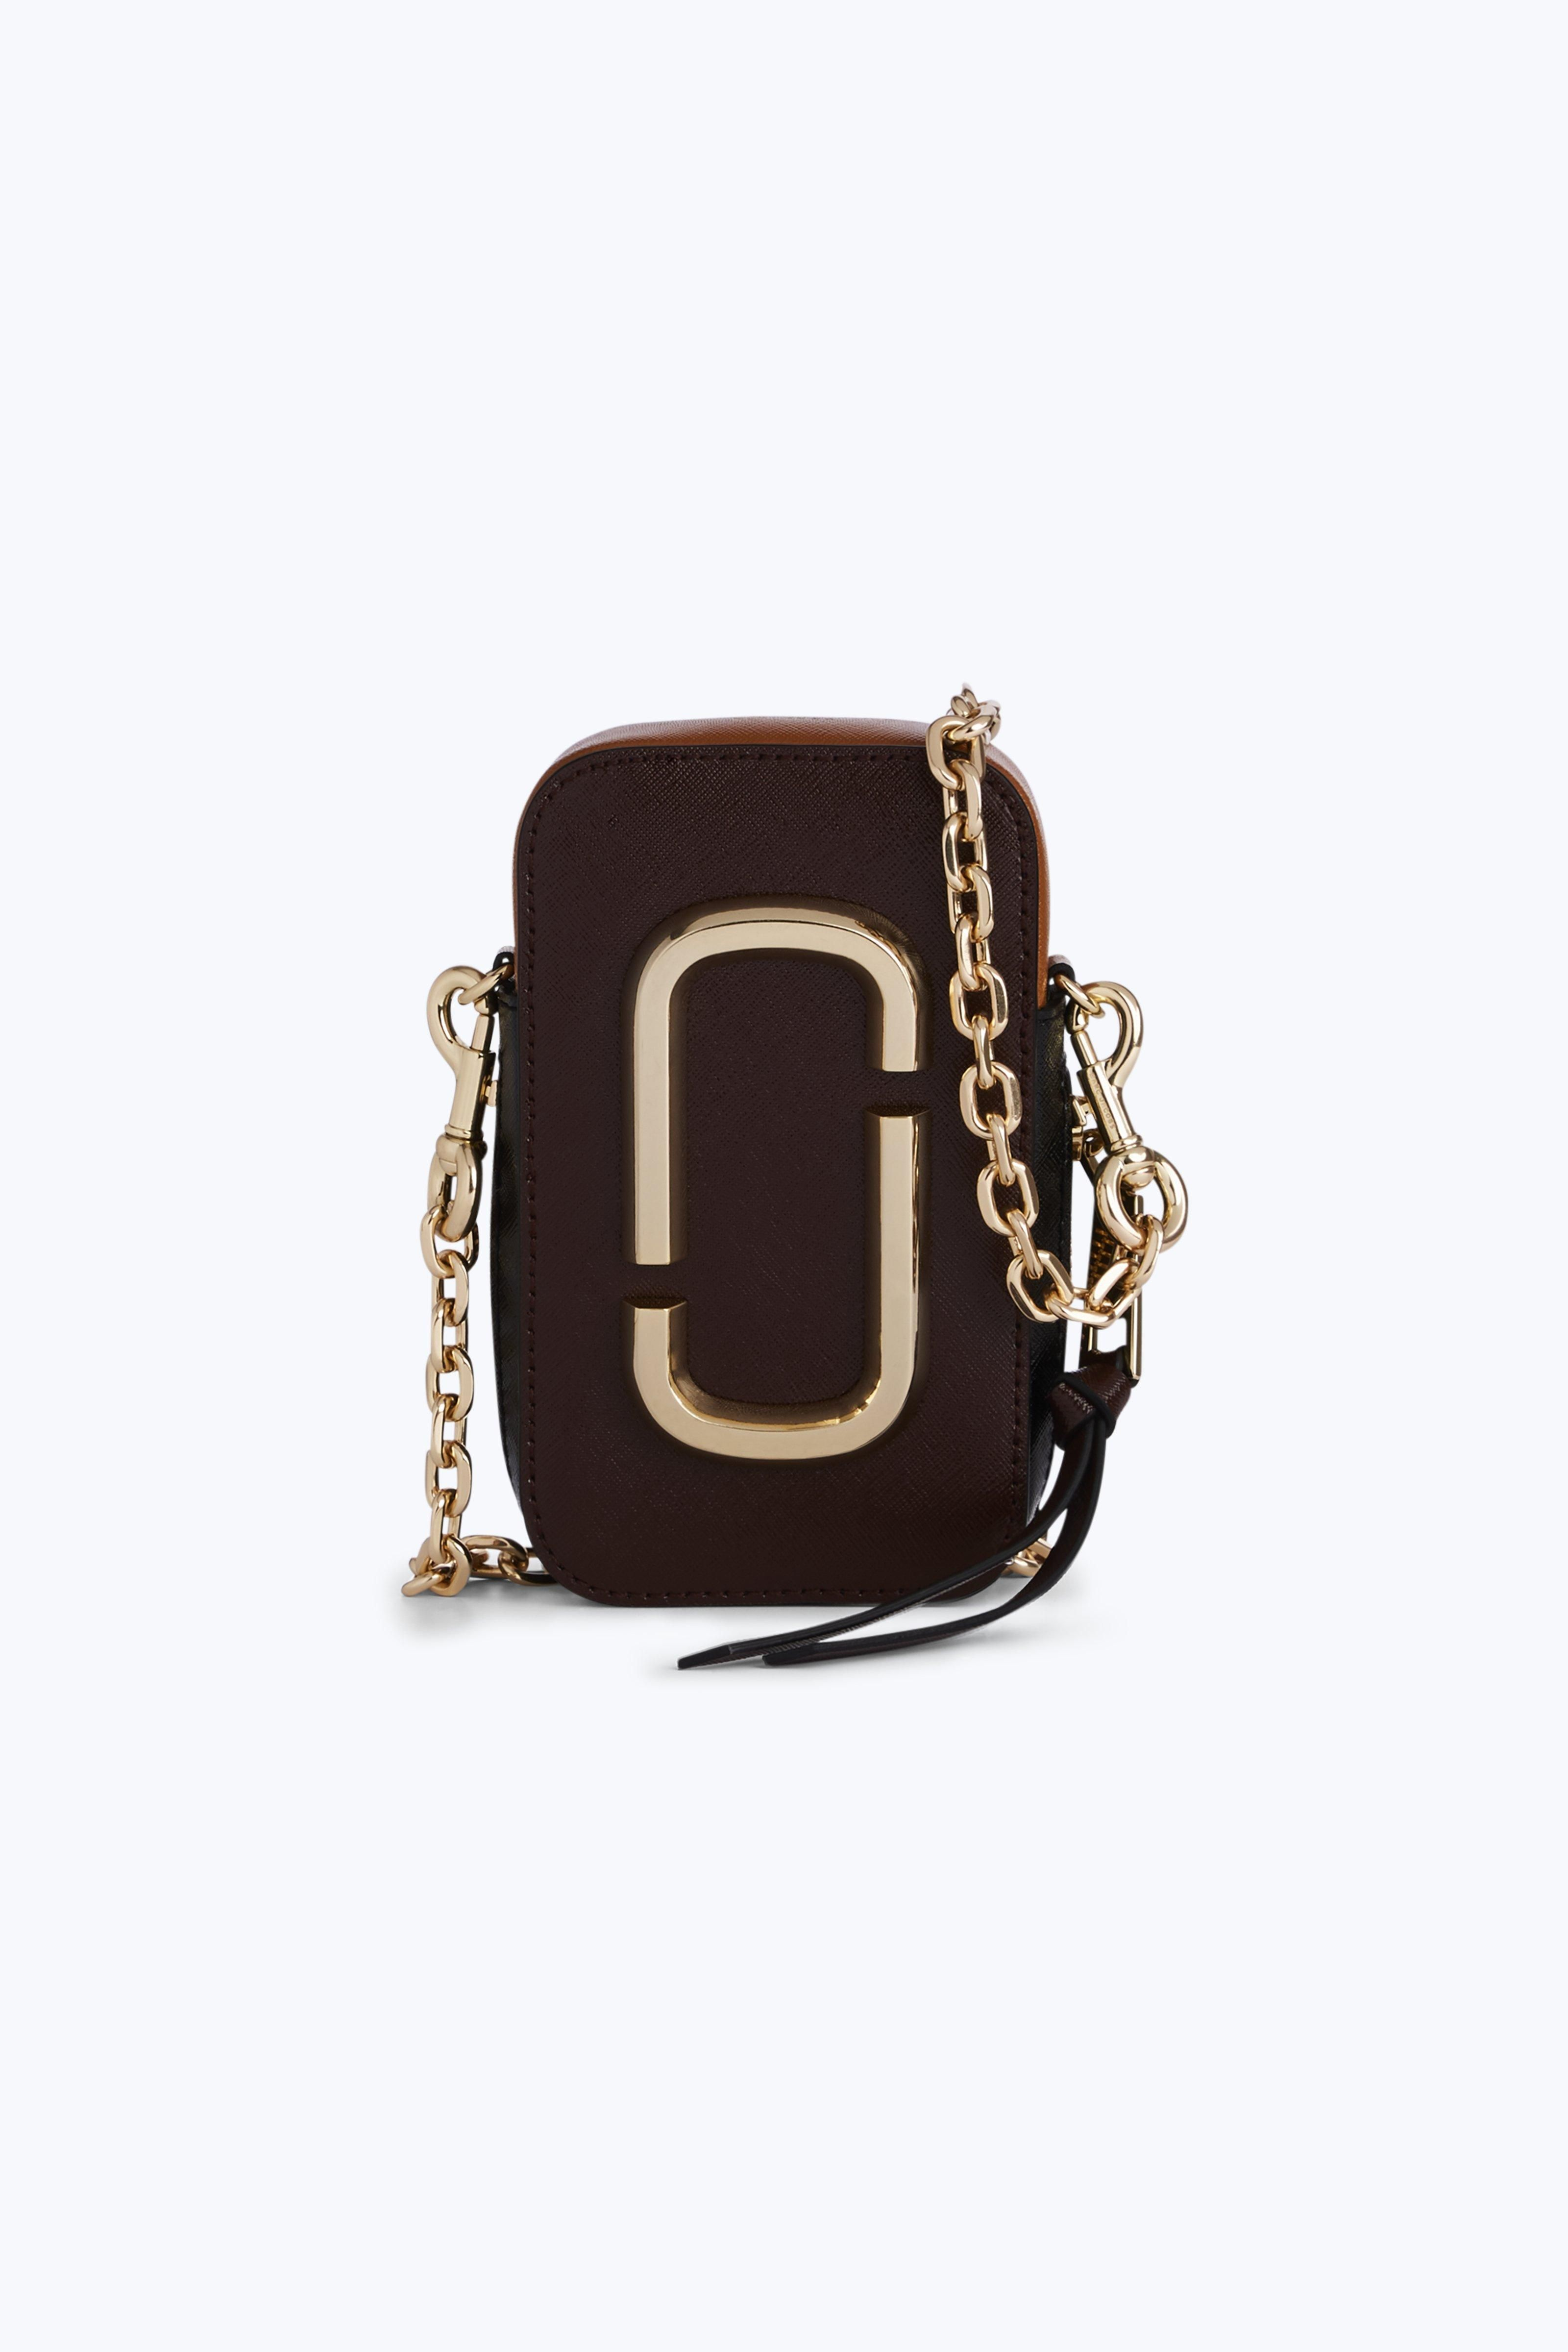 5e3b9283c43f Marc Jacobs Hot Shot Bag in Chocolate